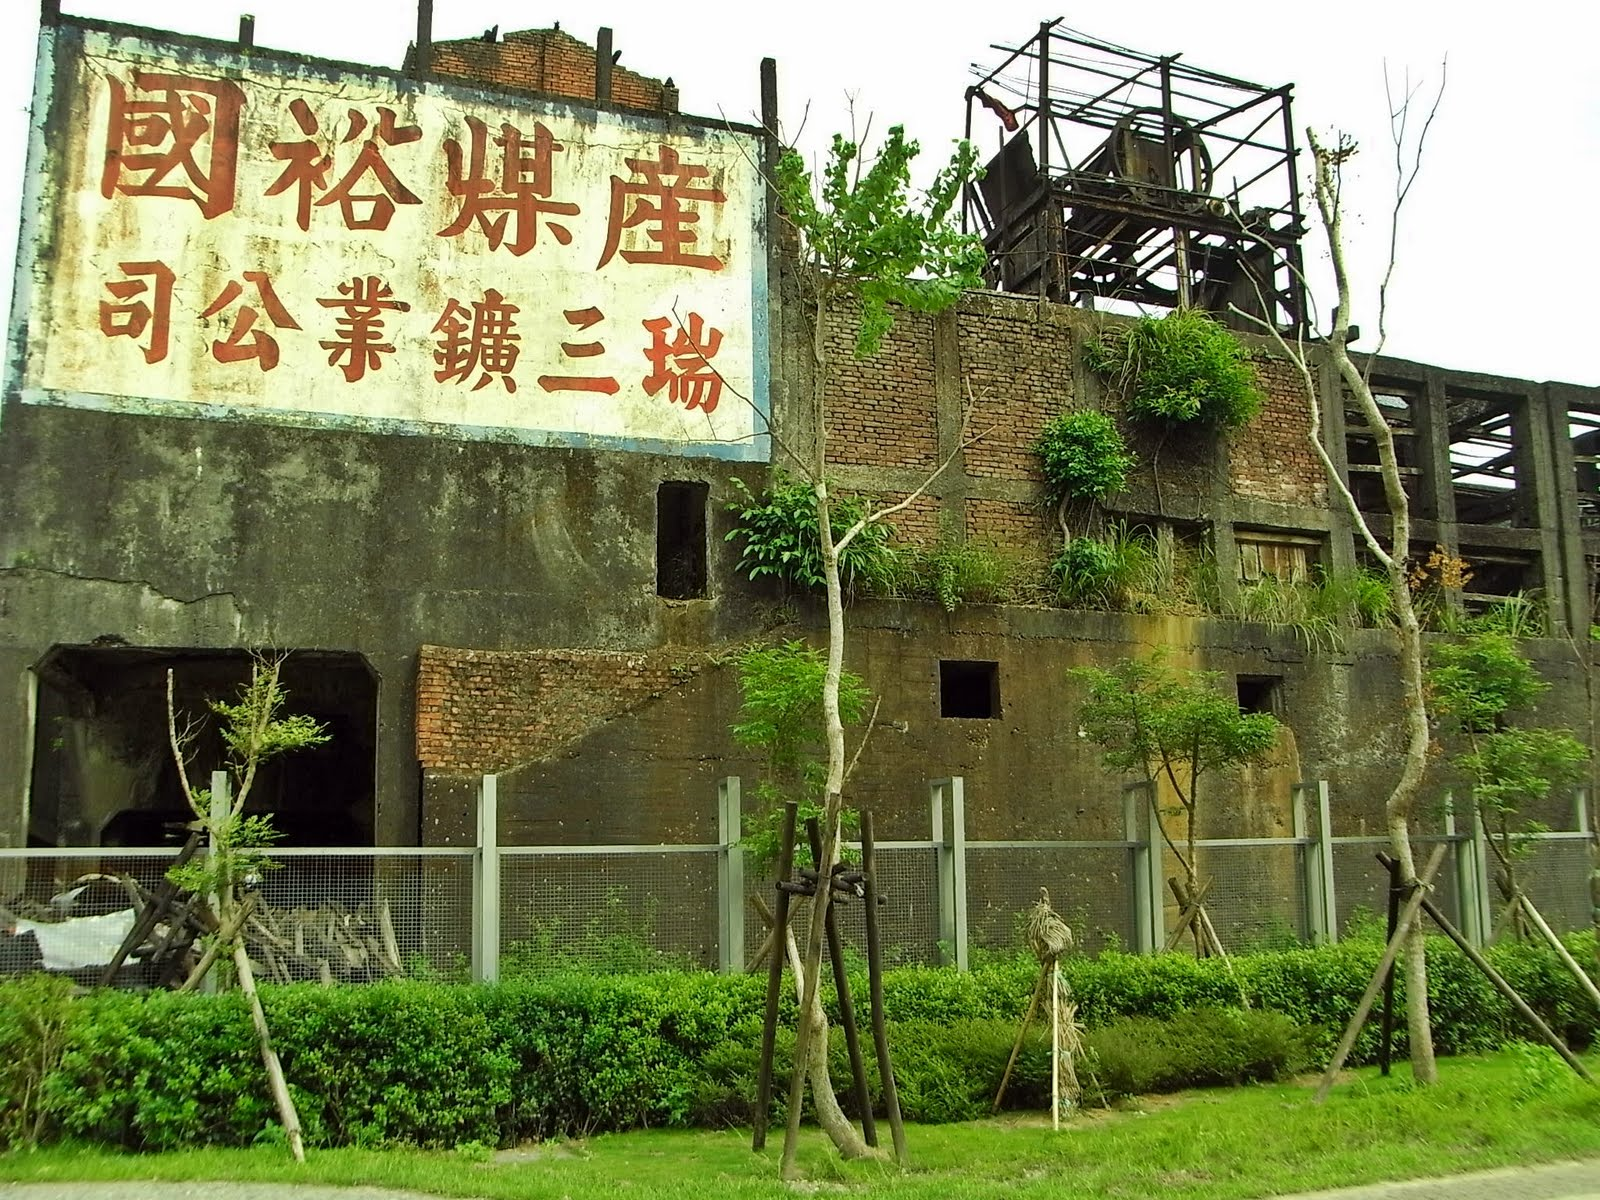 Shih-Wen's Life: [猴硐]煤礦博物園區Houtong Coalmine Ecological Park